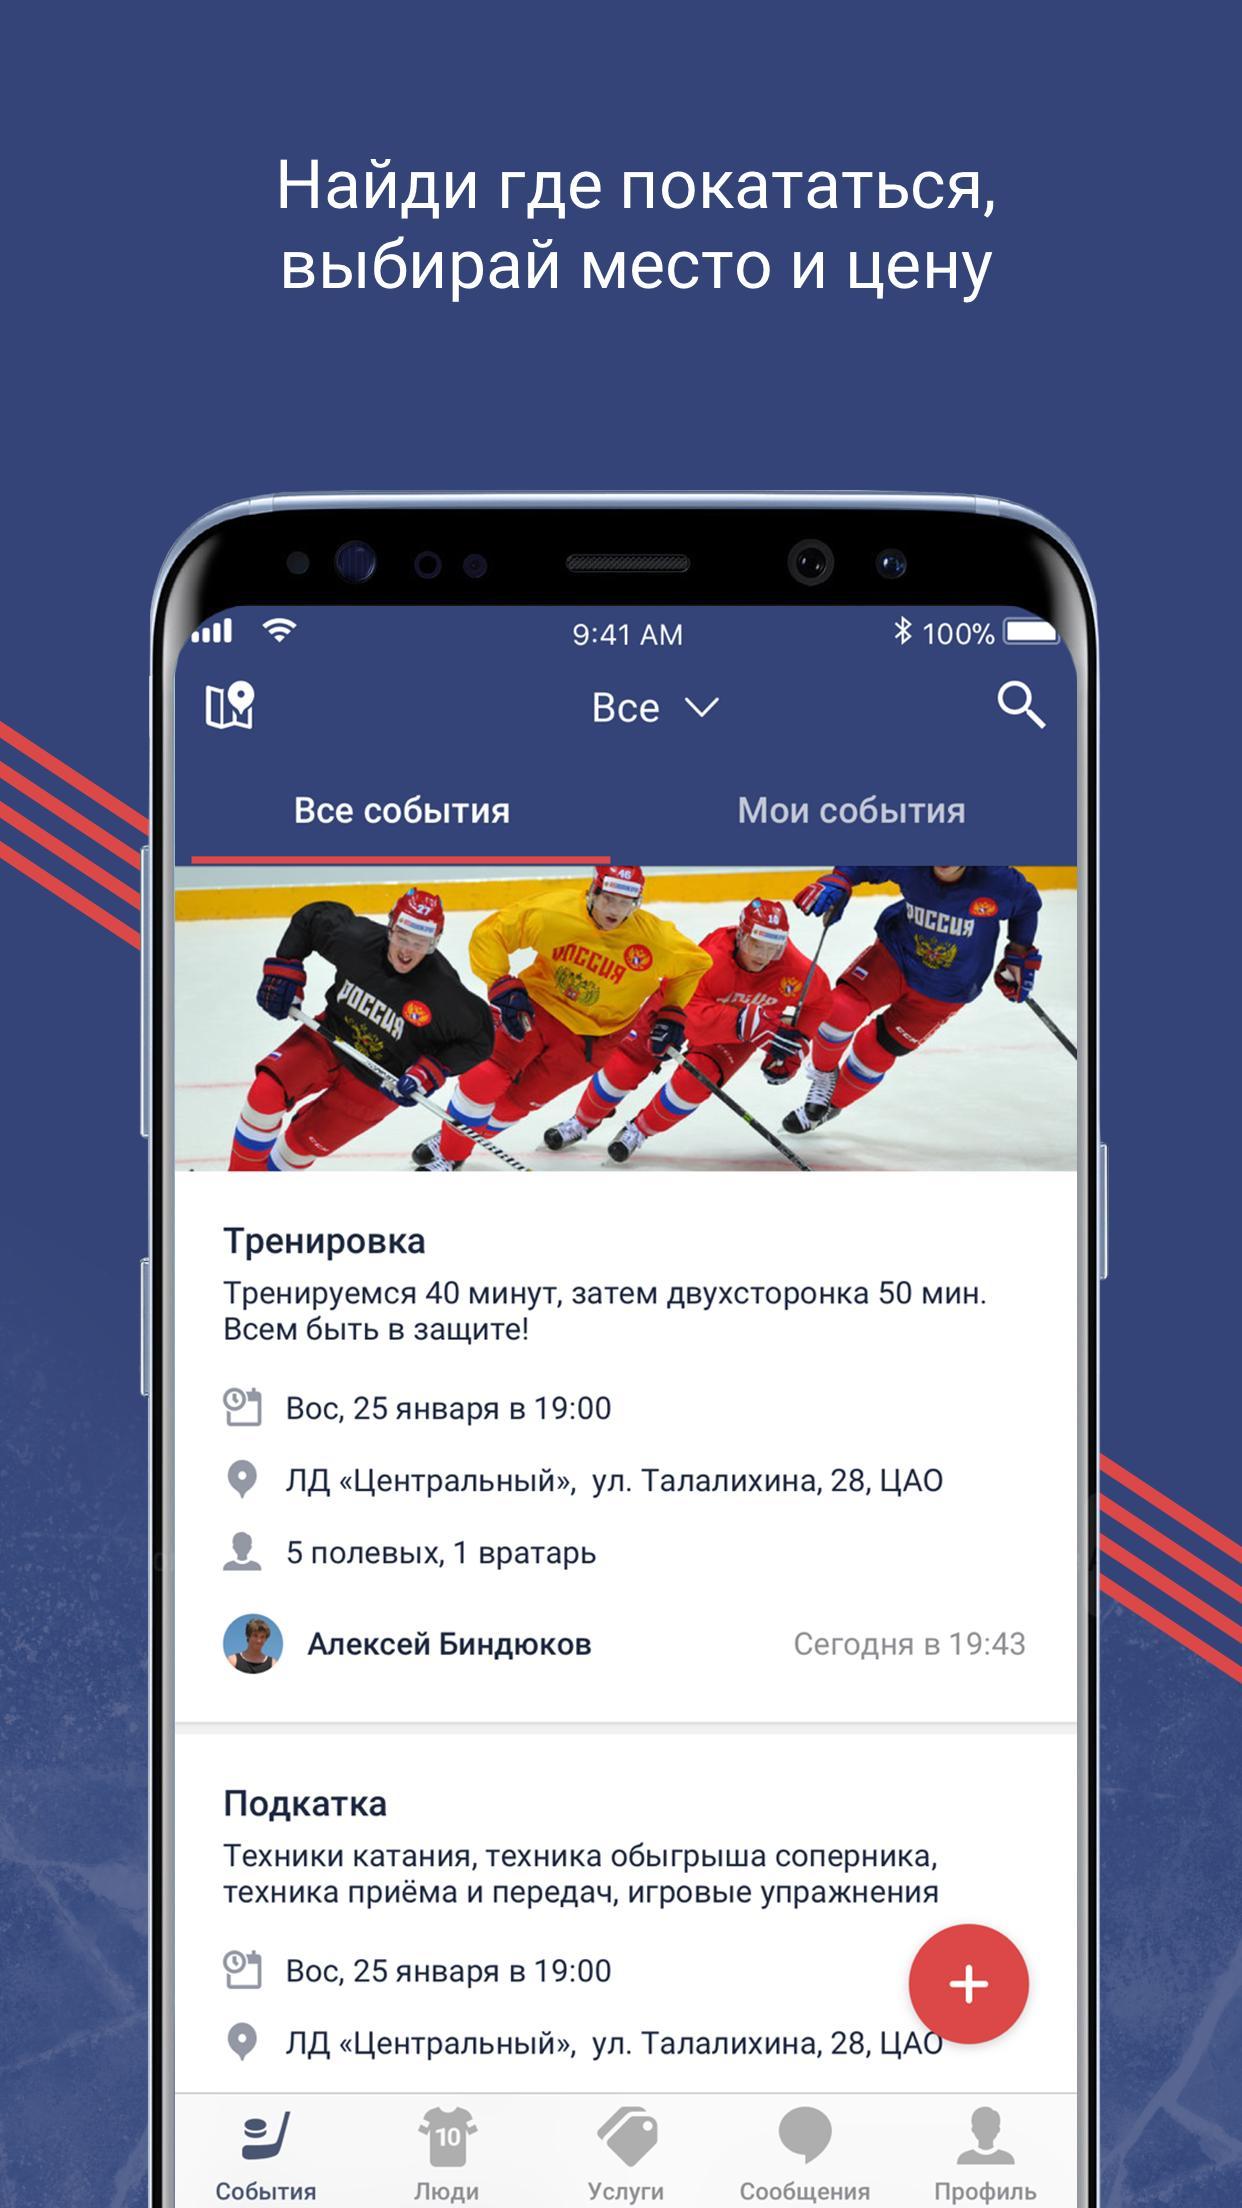 Go Hockey! poster